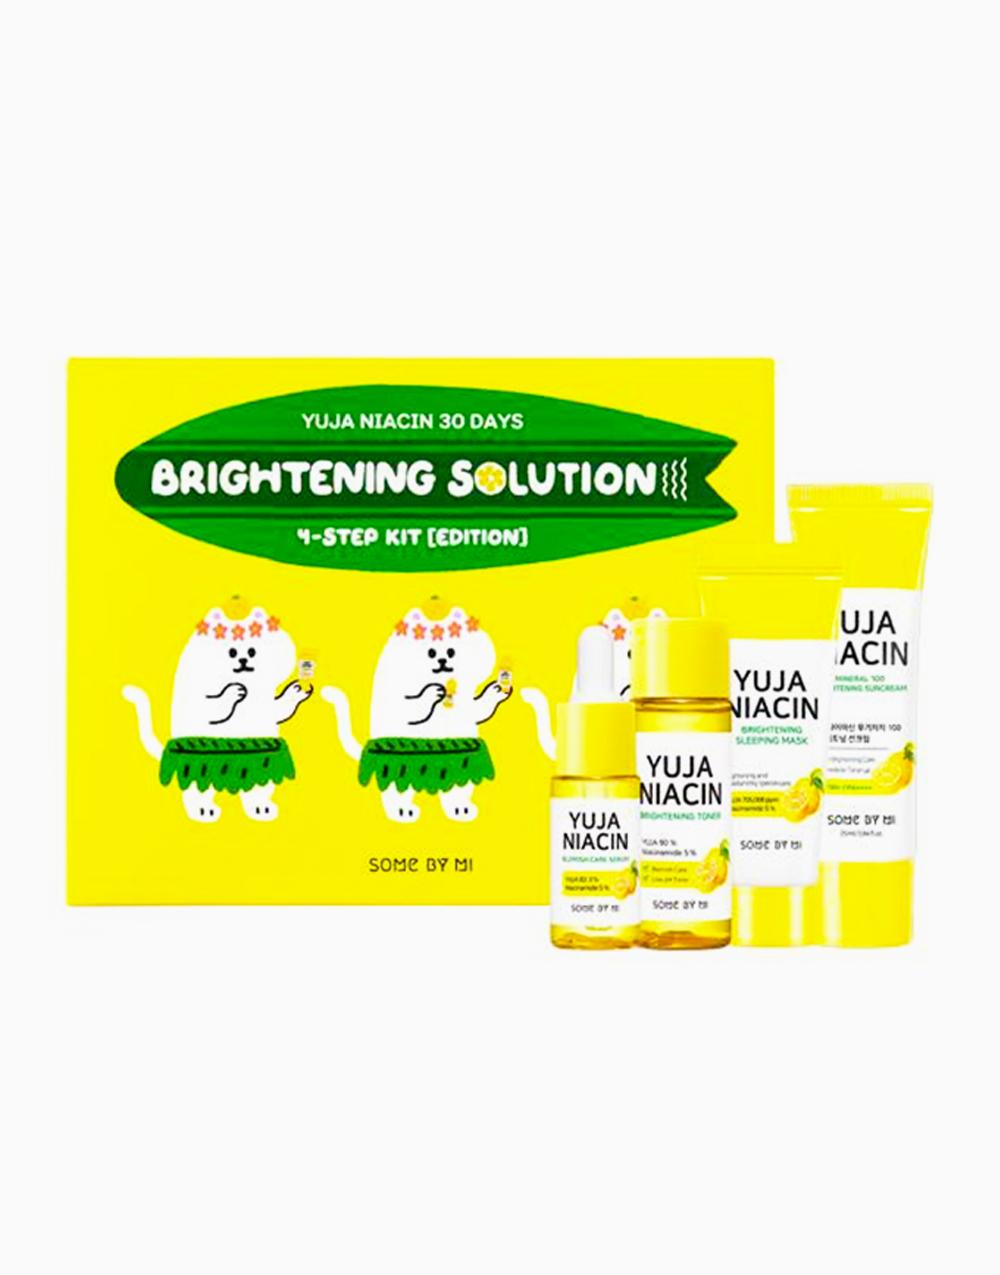 Yuja Niacin 30 Days Brightening Solution 4-Step Kit by Some By Mi